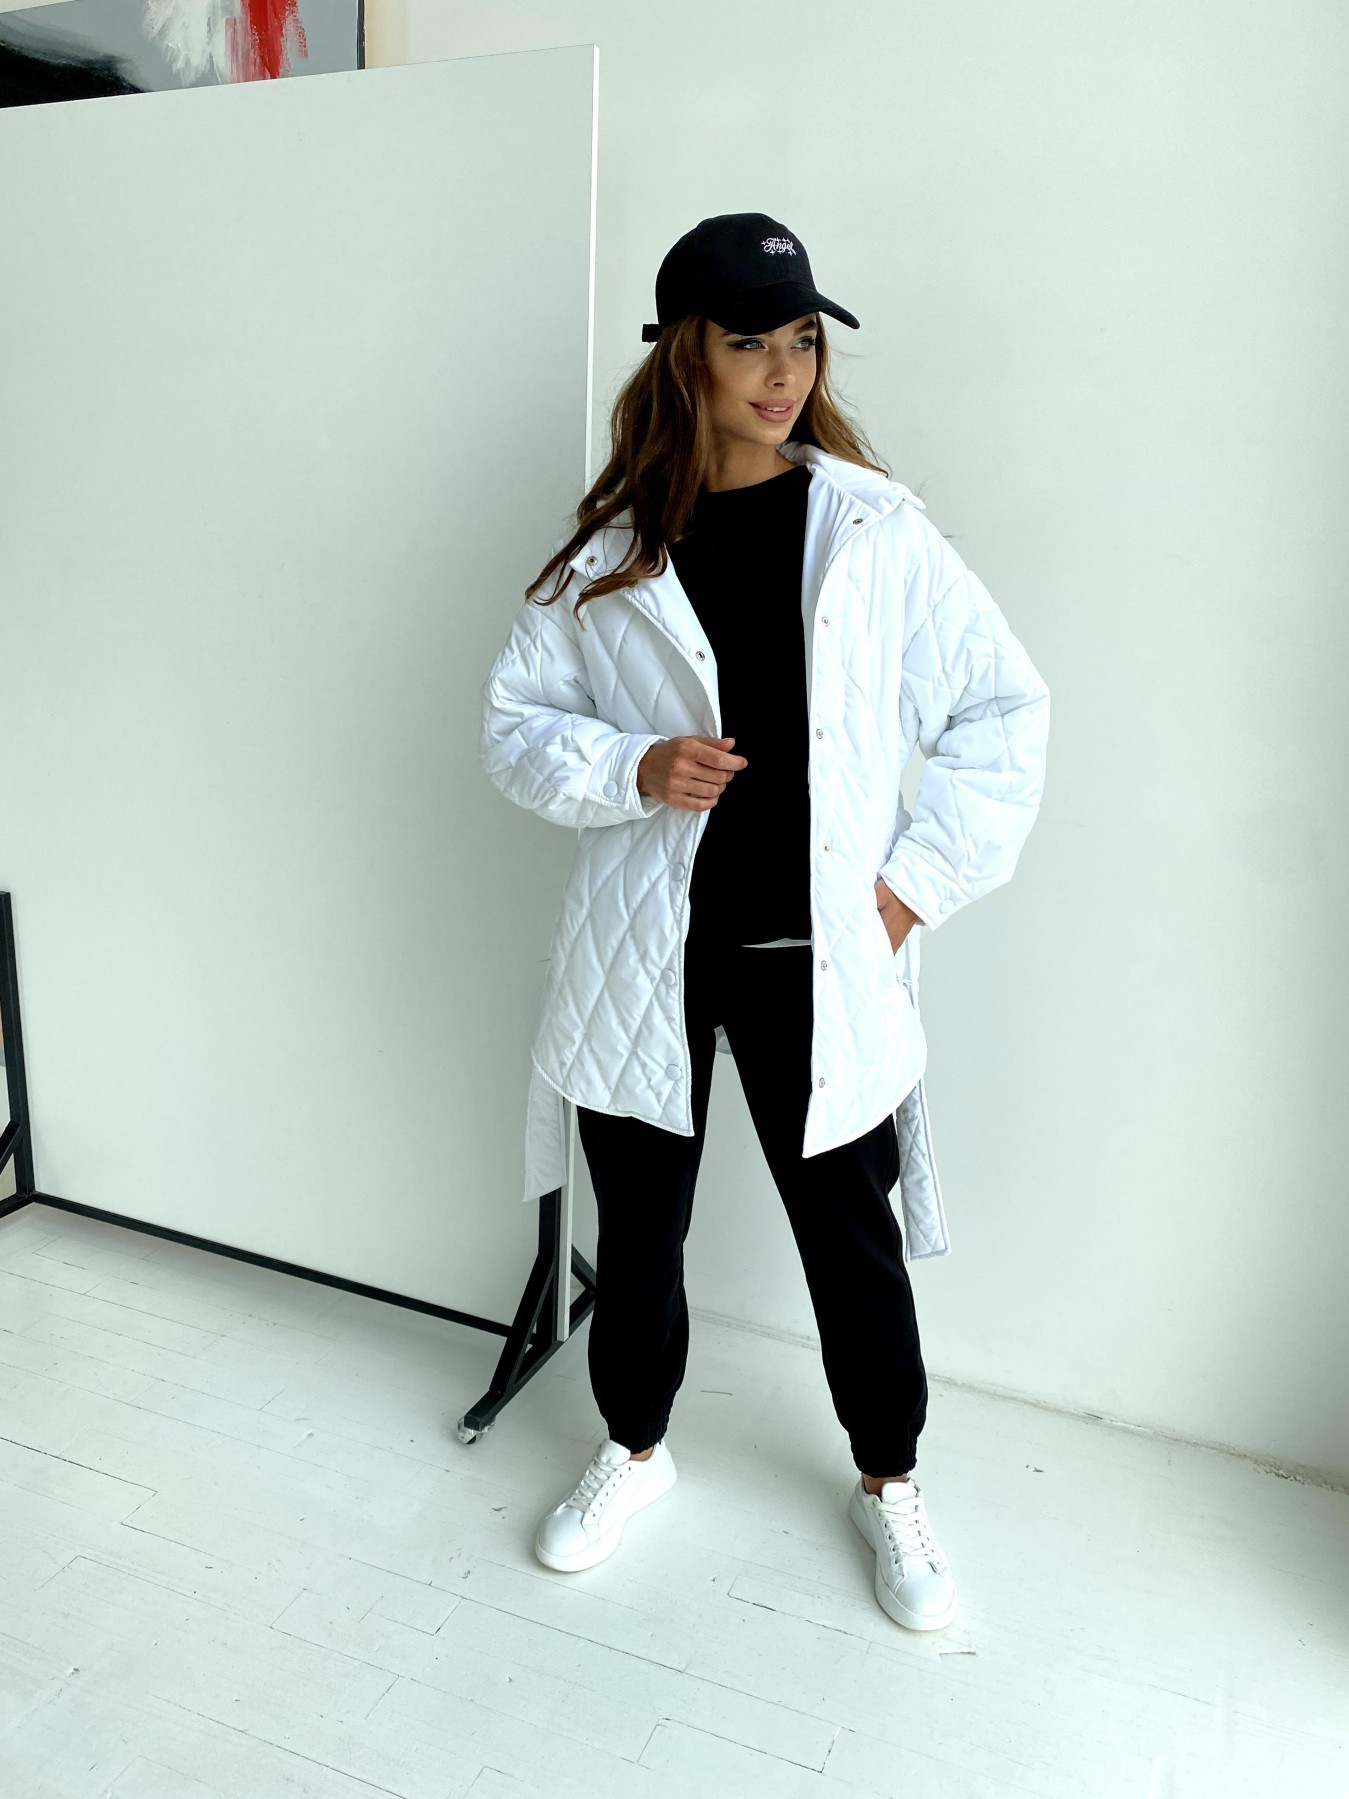 Пазл стеганая куртка из плащевки 11764 АРТ. 48509 Цвет: Молоко 12 - фото 5, интернет магазин tm-modus.ru